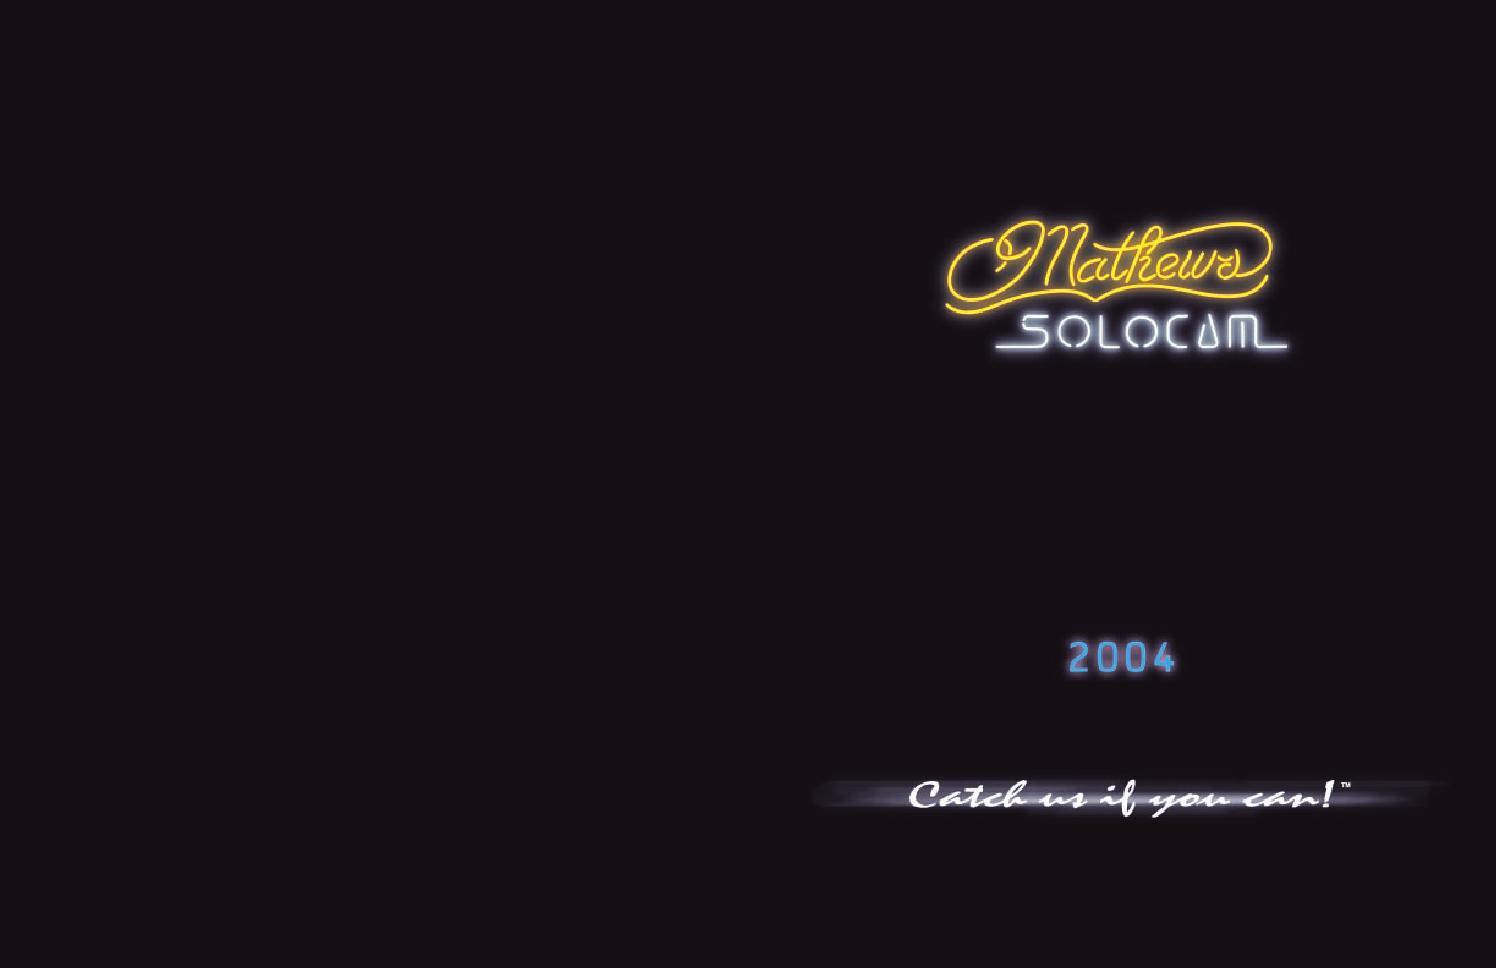 2004 Mathews Catalog by Mathews Inc - issuu